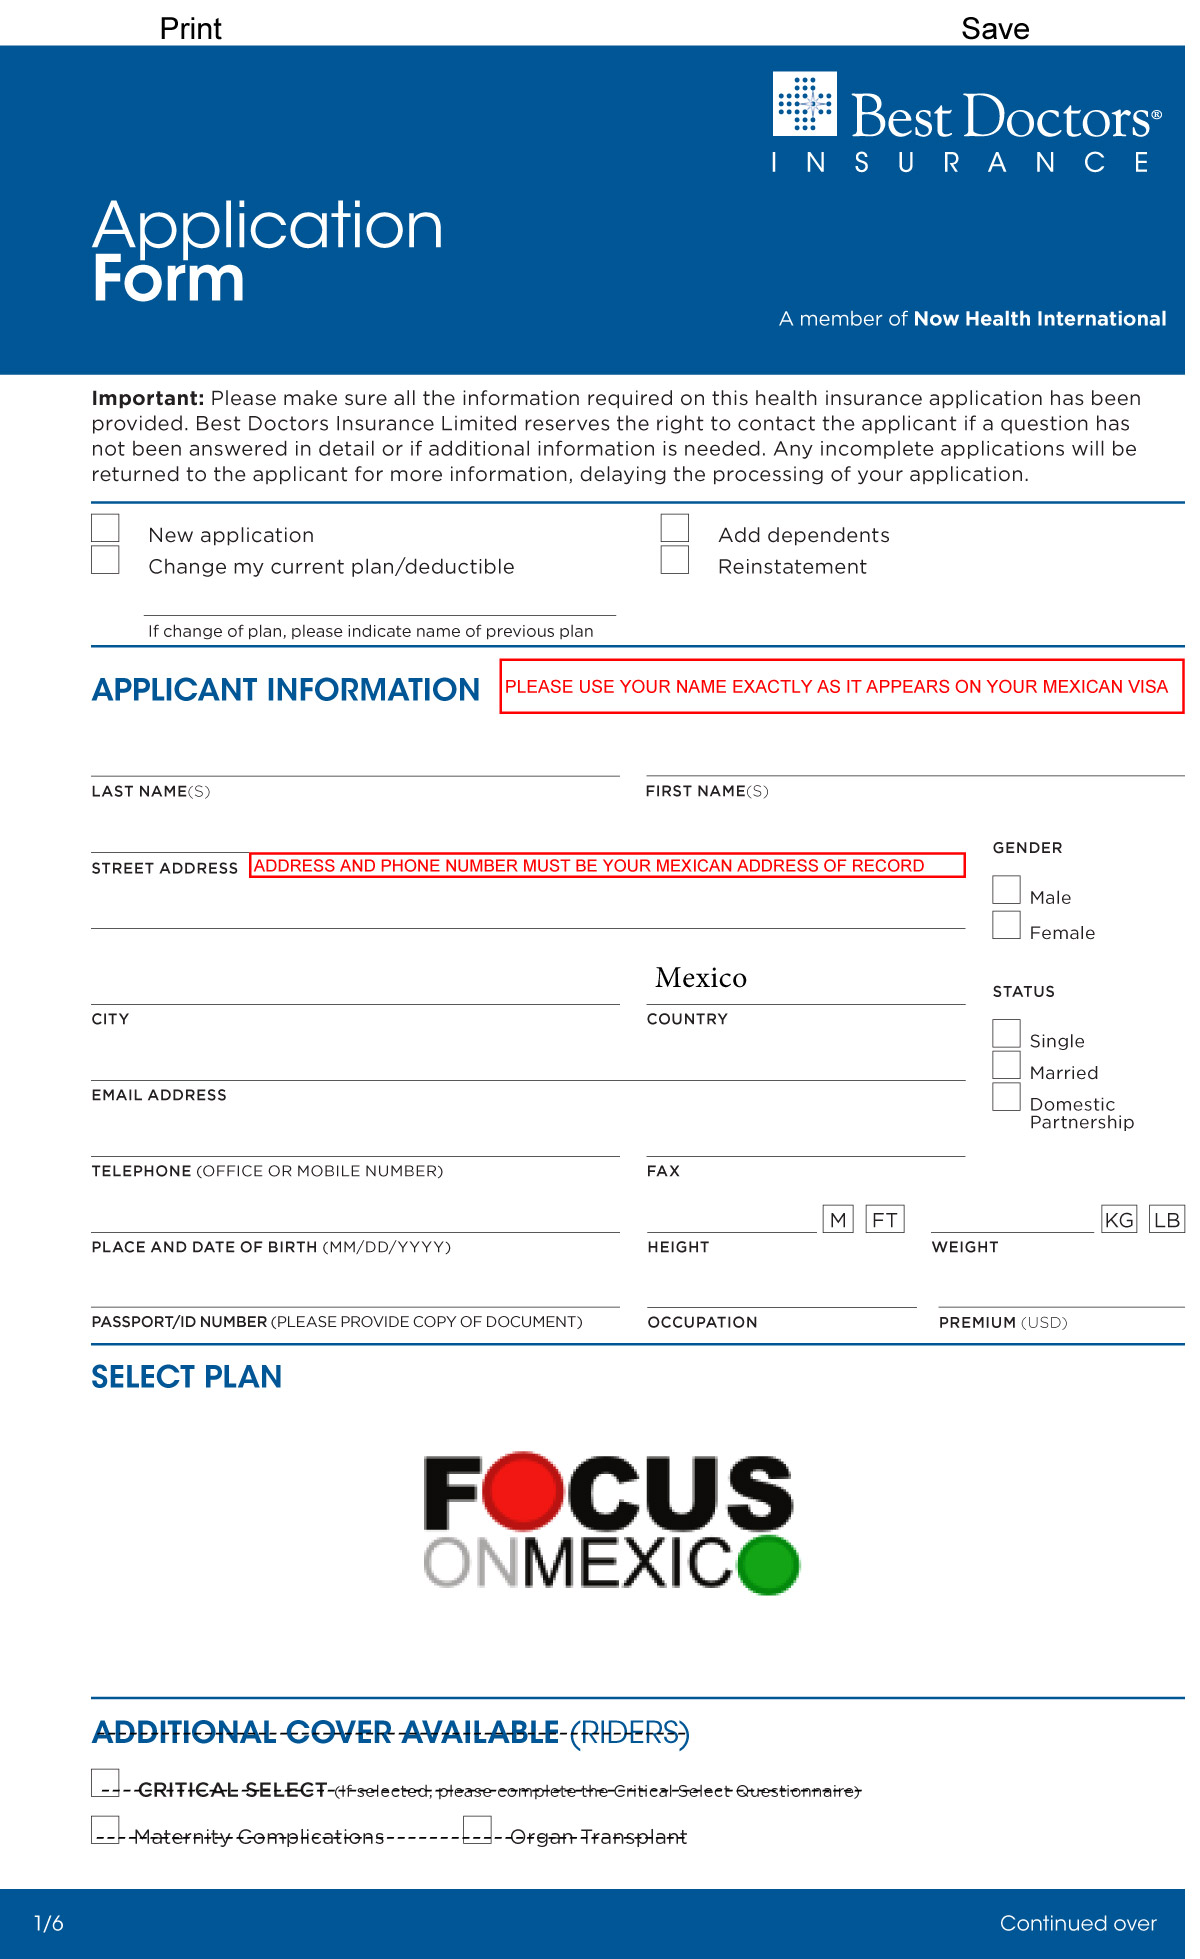 2017-Focus-Best-DoctorsL-Group-Appn-rev-Jan2017-1